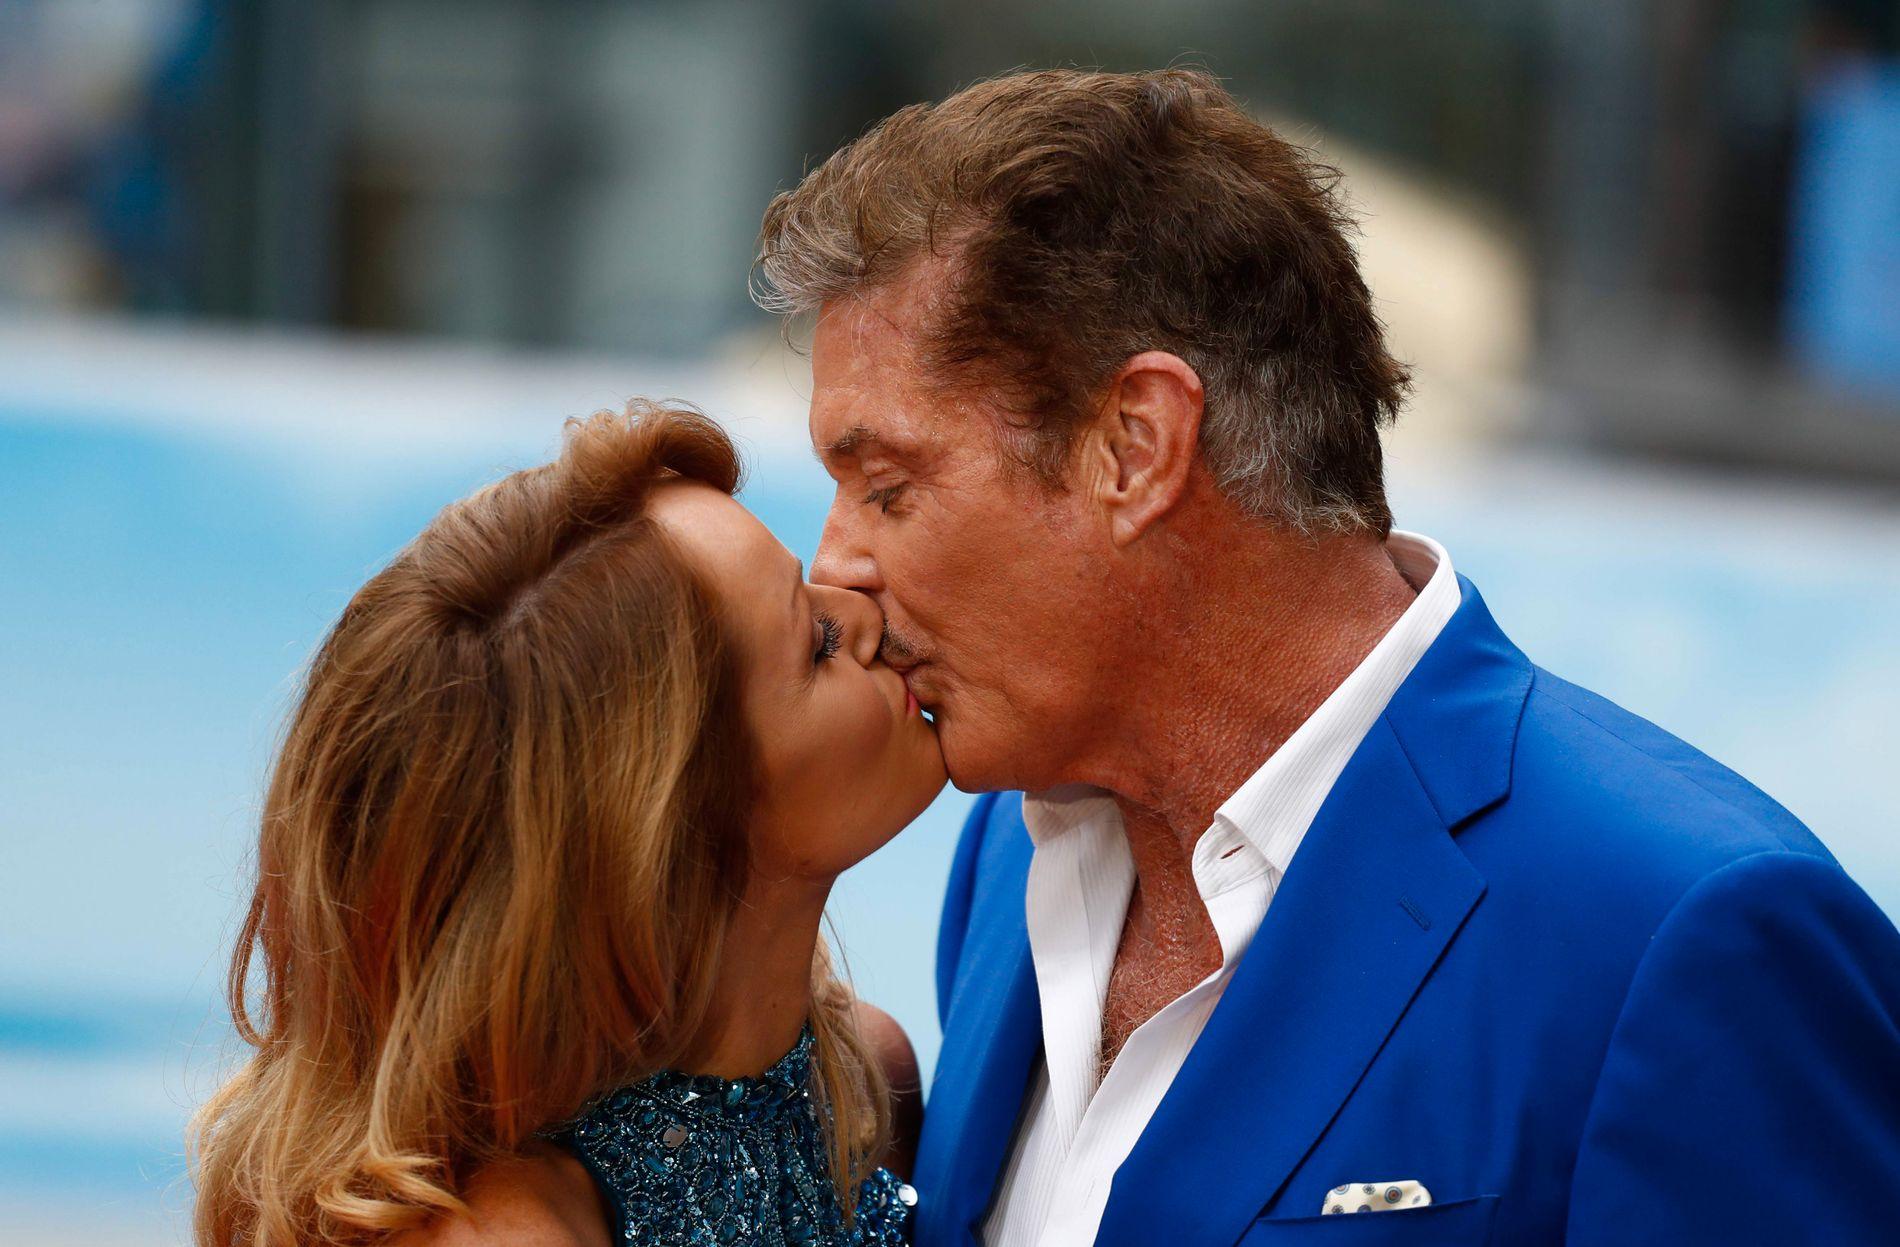 FORELSKET: David Hasselhoff og kjæresten Hayley Roberts på «Baywatch»-pressekonferanse i Berlin tirsdag.